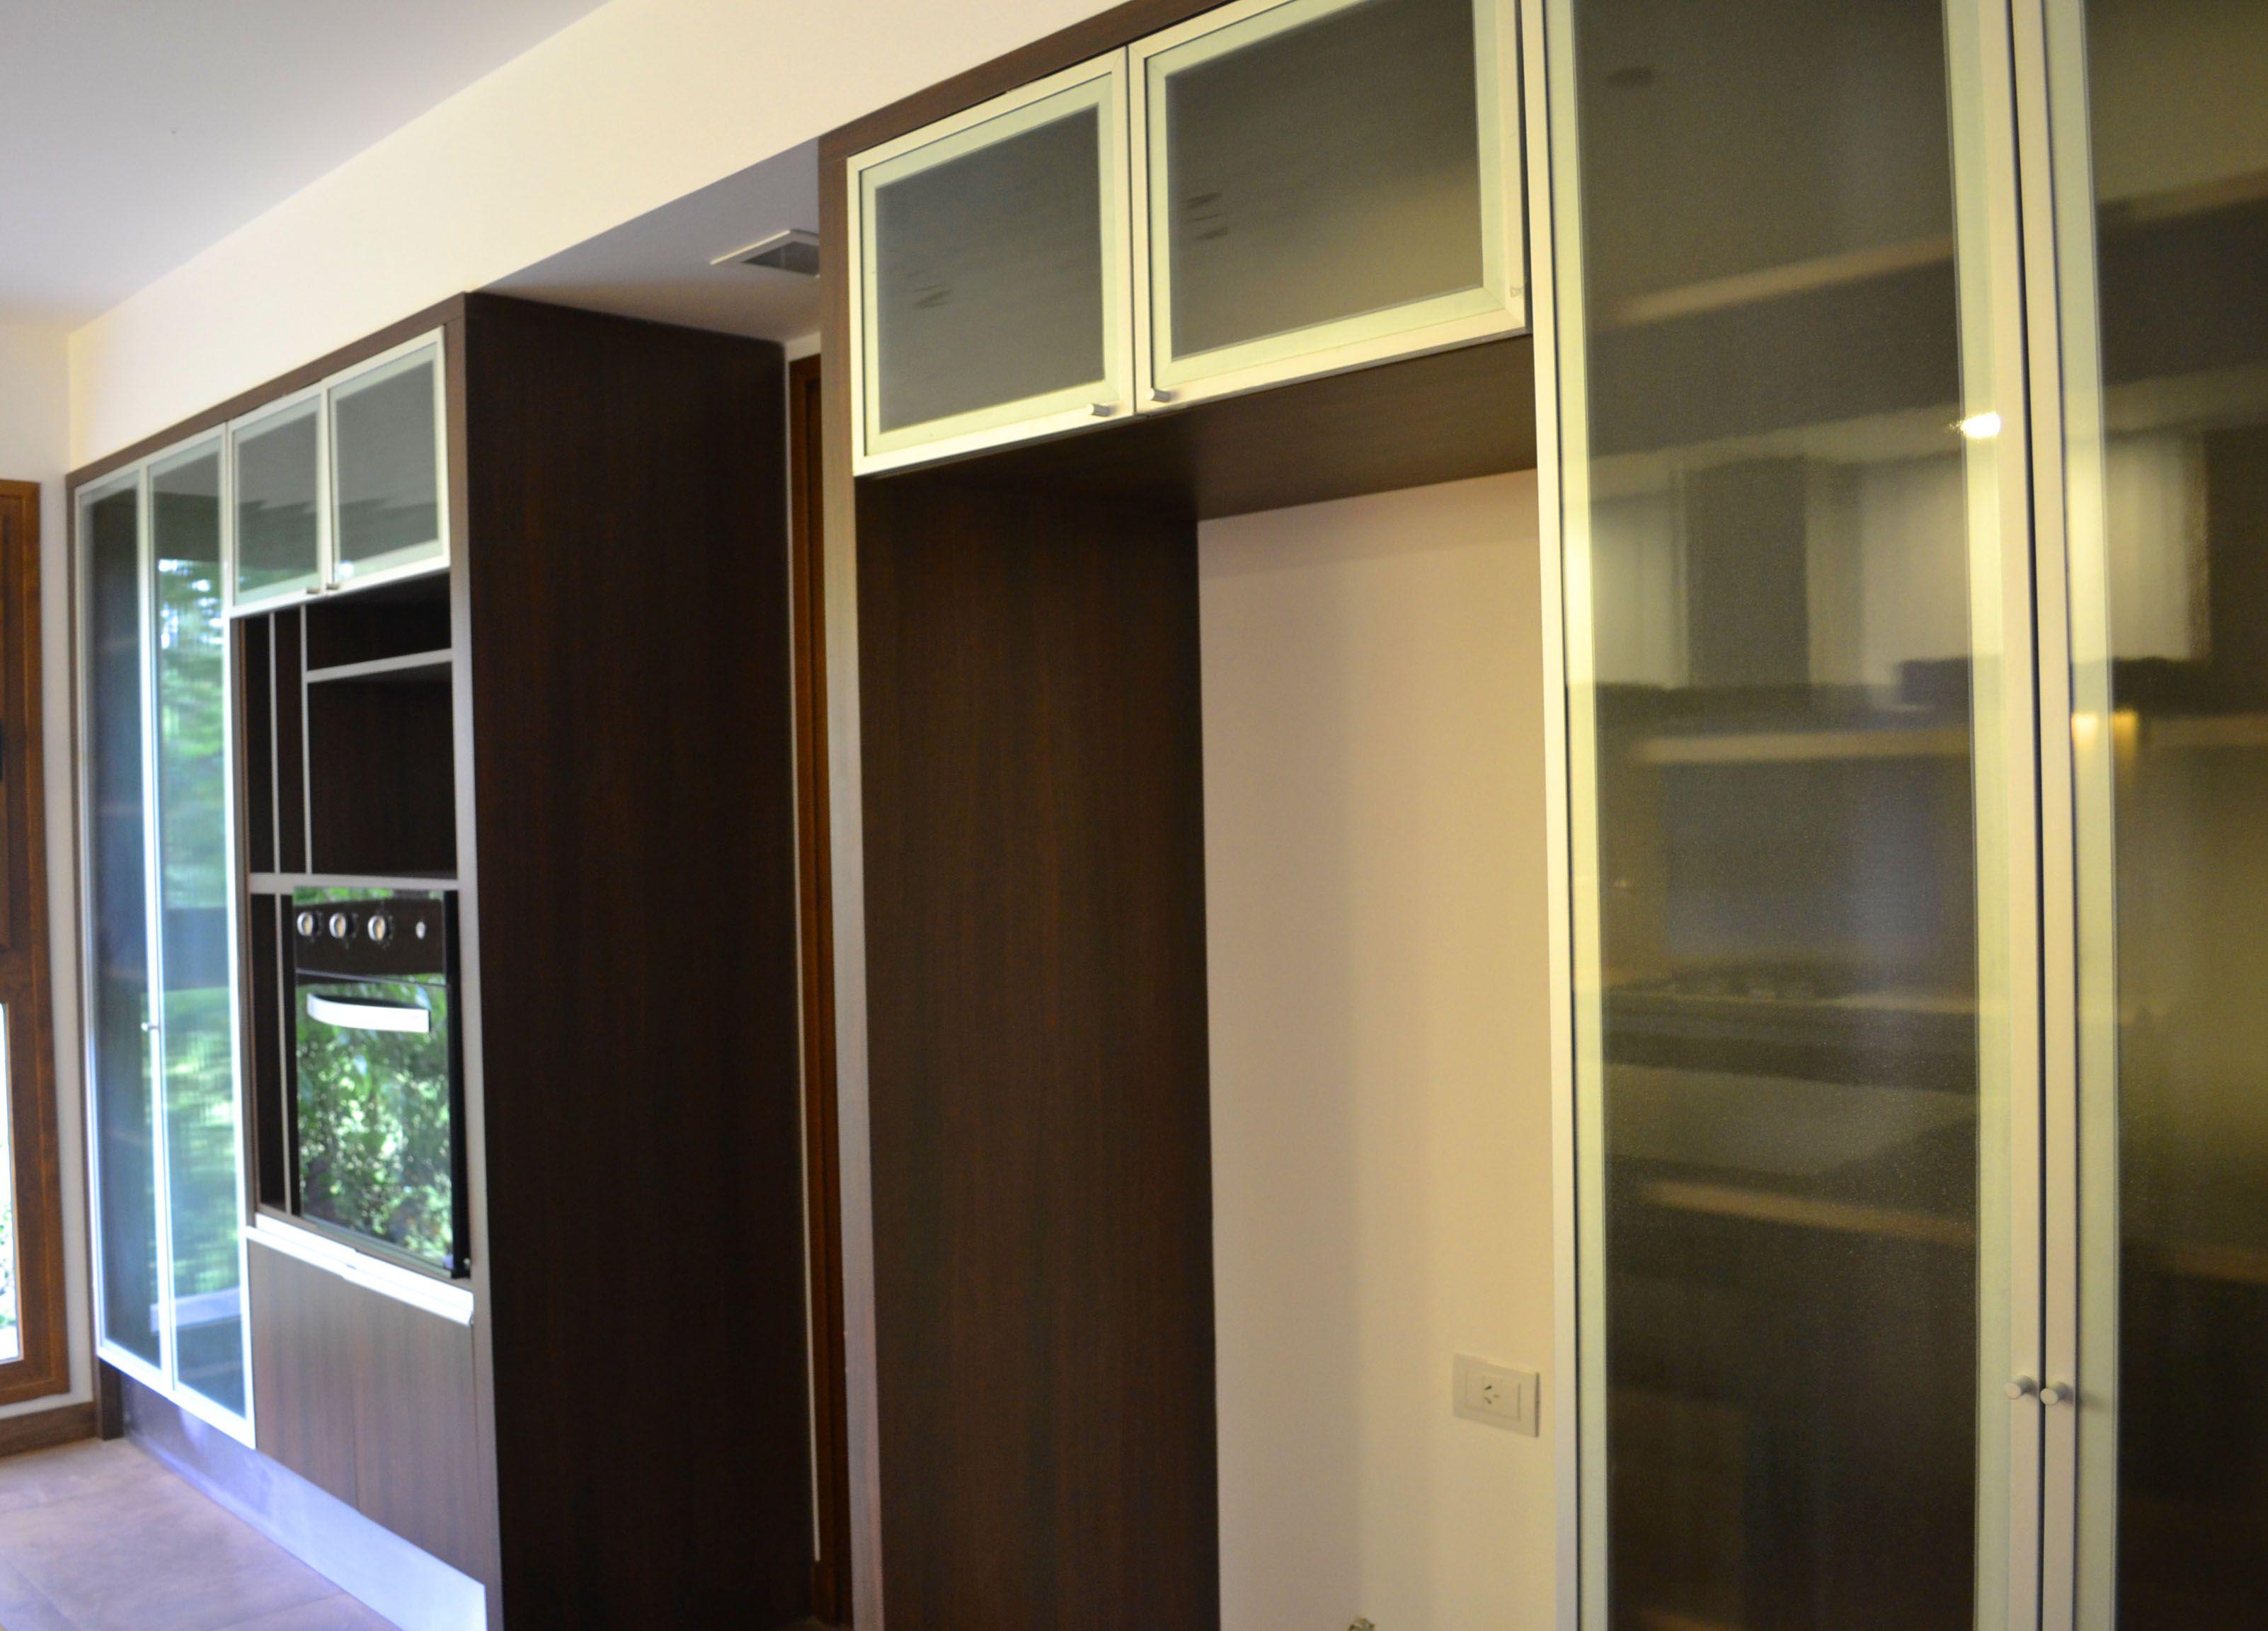 Melamina S Mil Madera Aluminio Vidrio Esmerilado Dise O  # Muebles Gustavo Martin